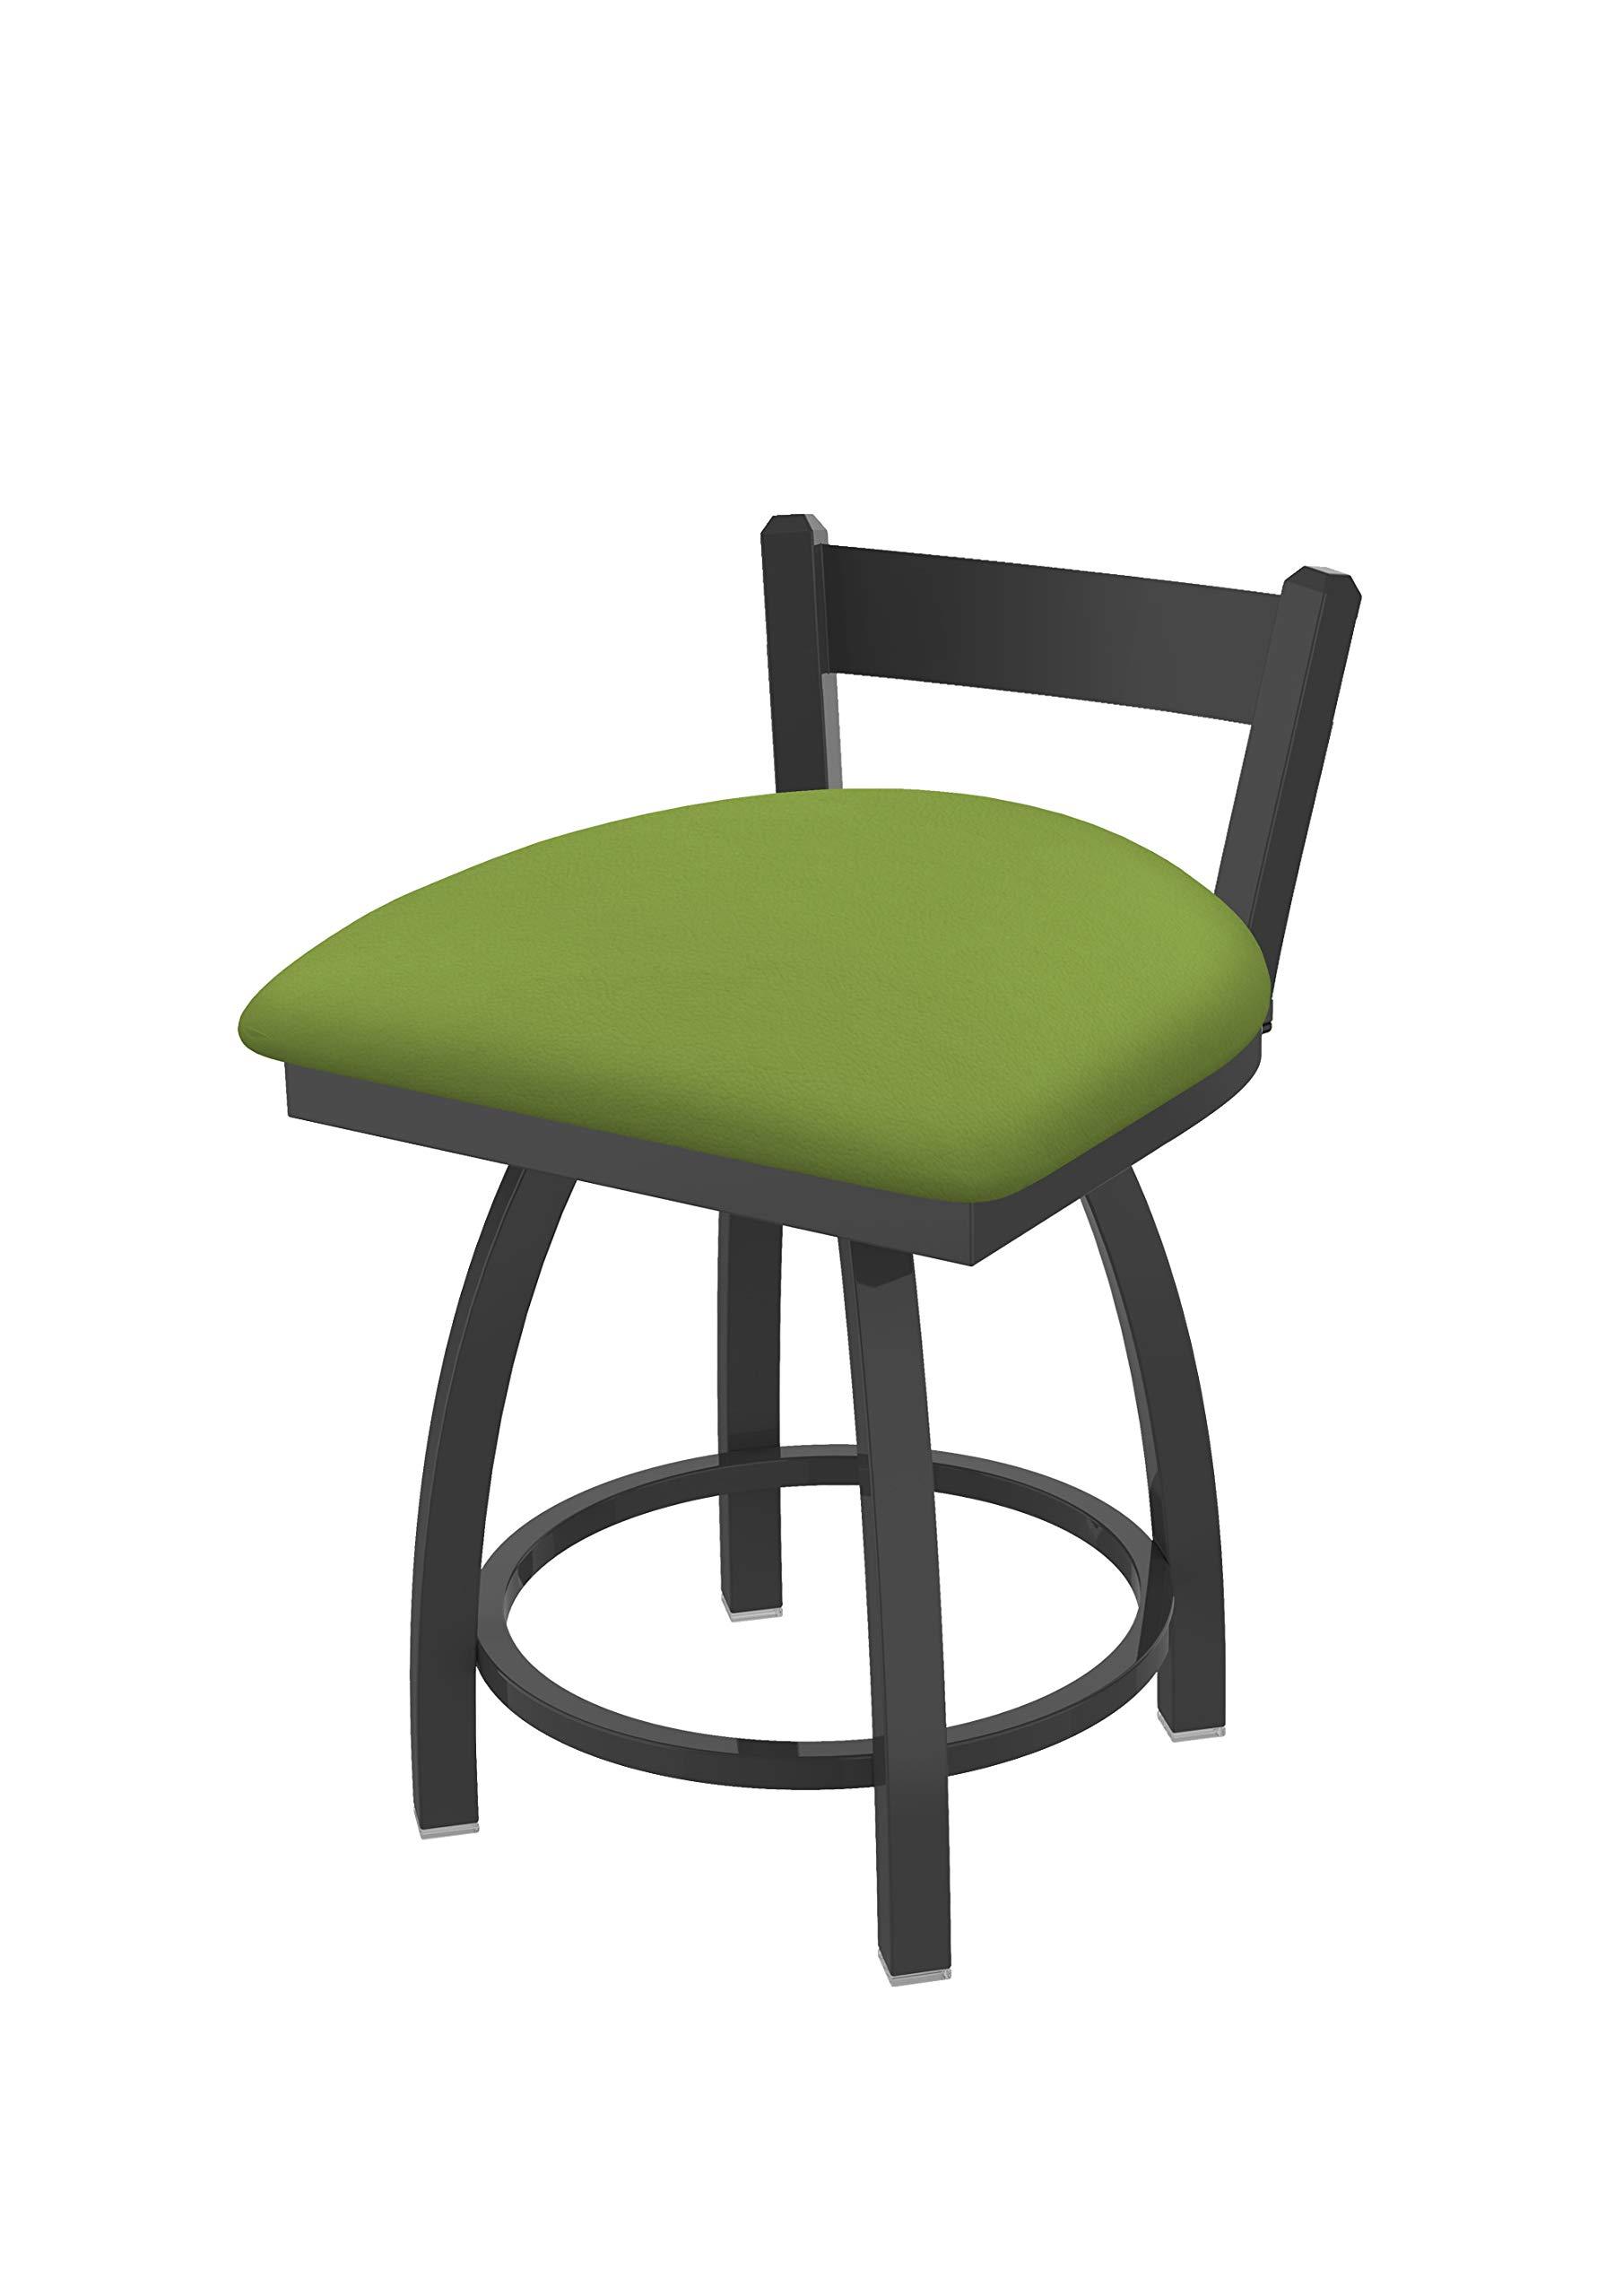 Holland Bar Stool Co. 82118PW009 821 Catalina 18'' Low Back Swivel Vanity Pewter Finish and Canter Kiwi Green Seat Bar Stool